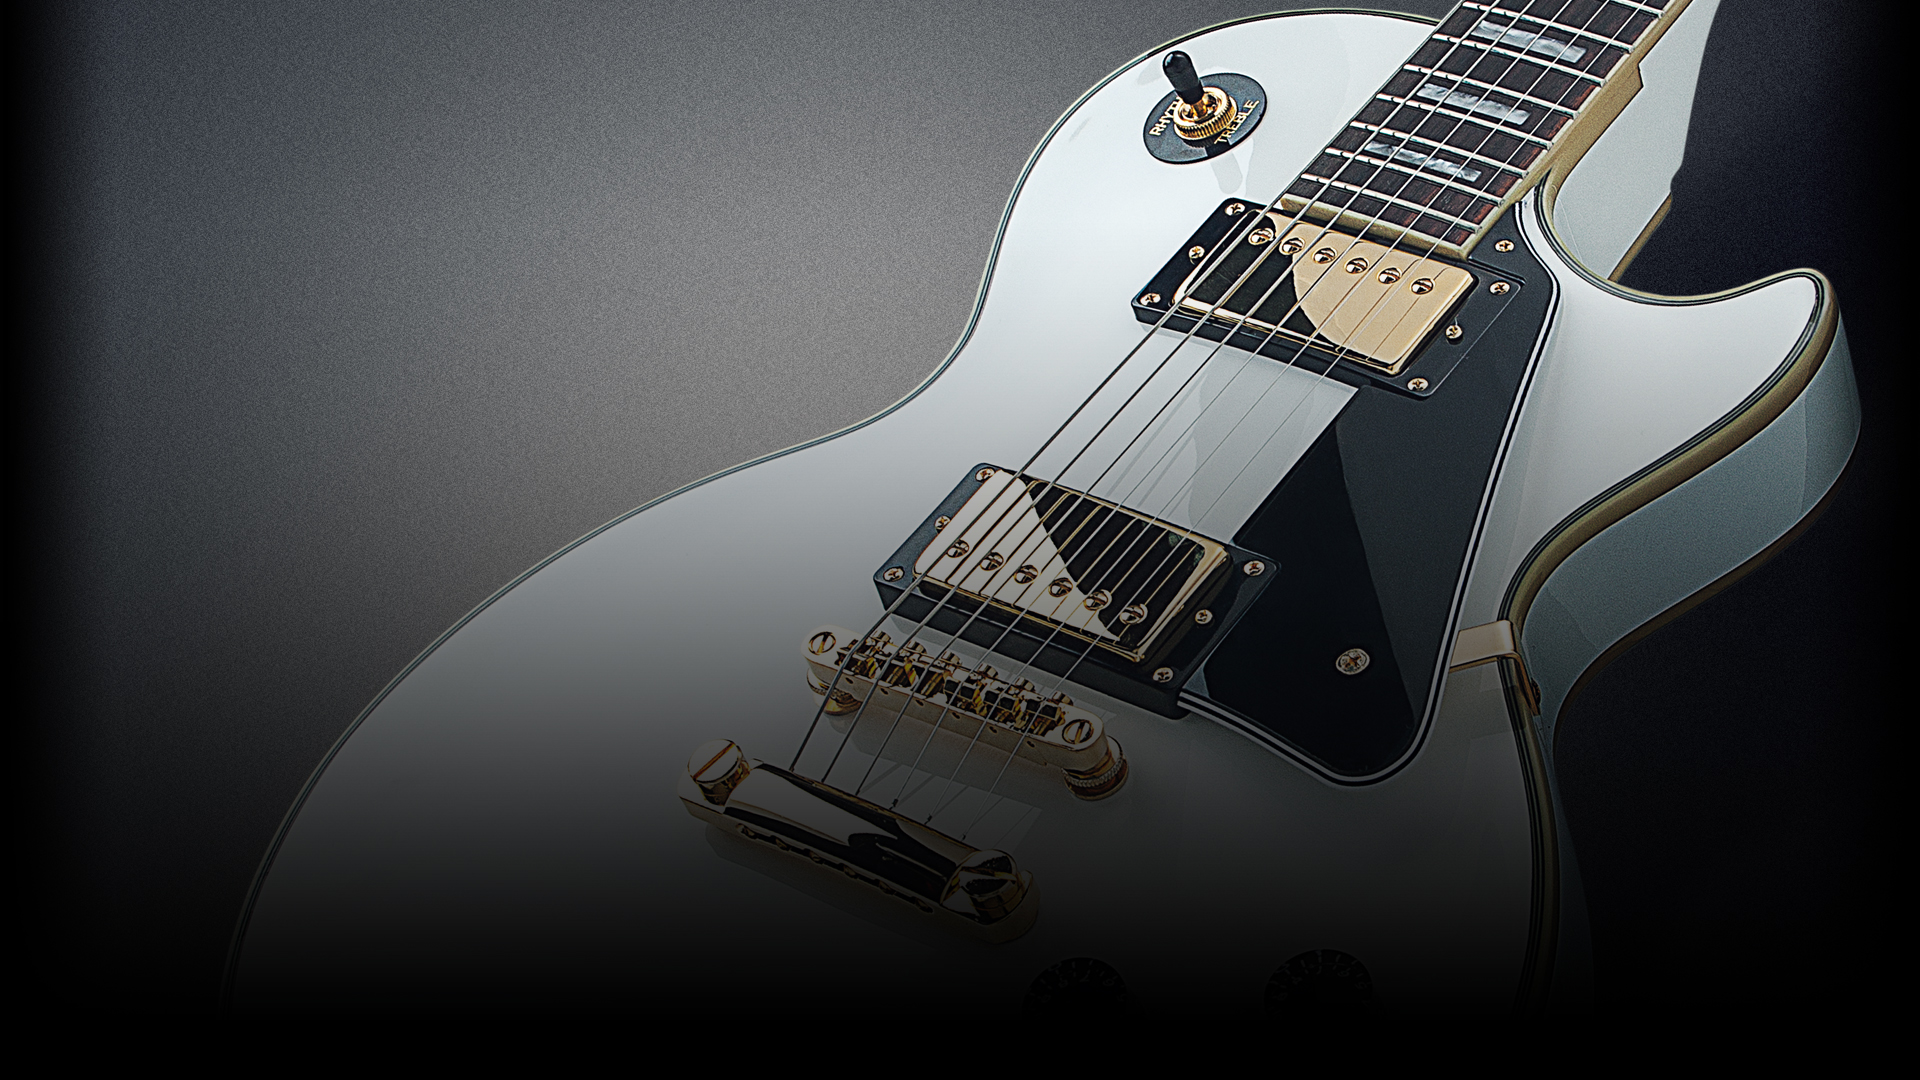 Steam Community Market Listings for 221680 Guitar 1920x1080